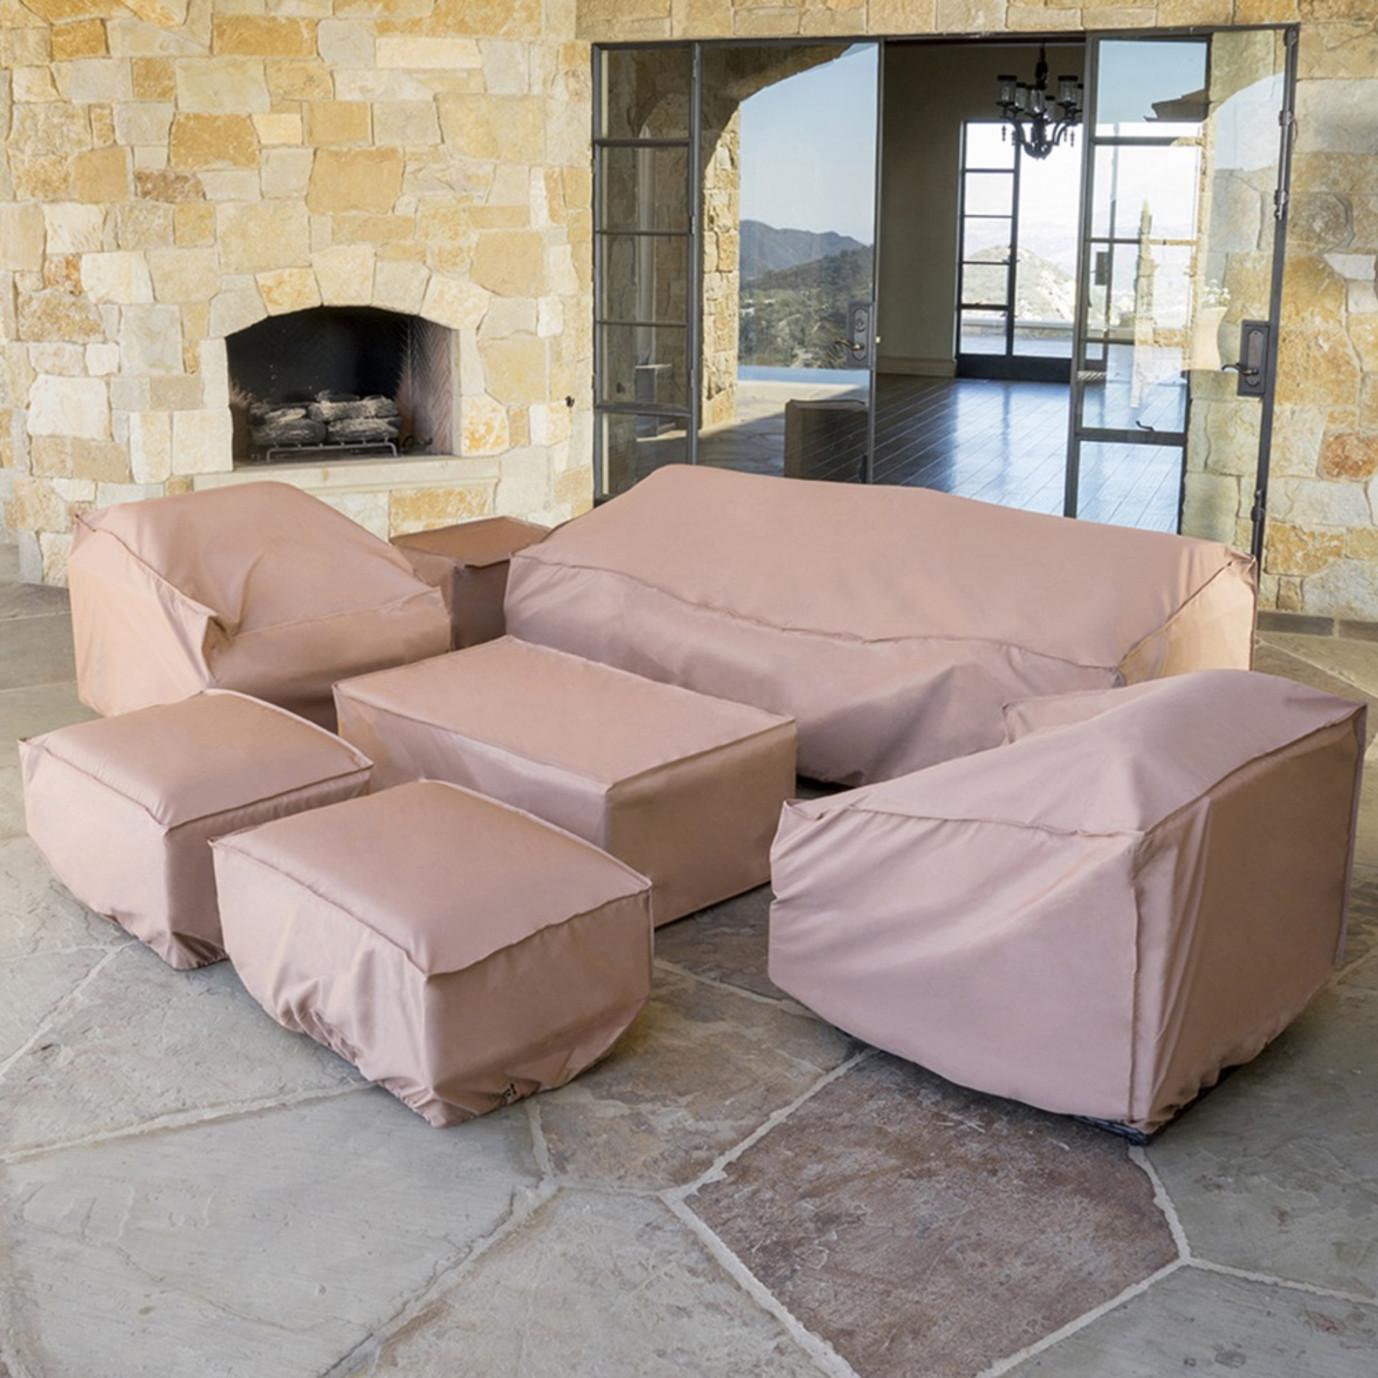 Portofino Comfort 7pc Deep Seating Set With Furniture Covers Heather Beige